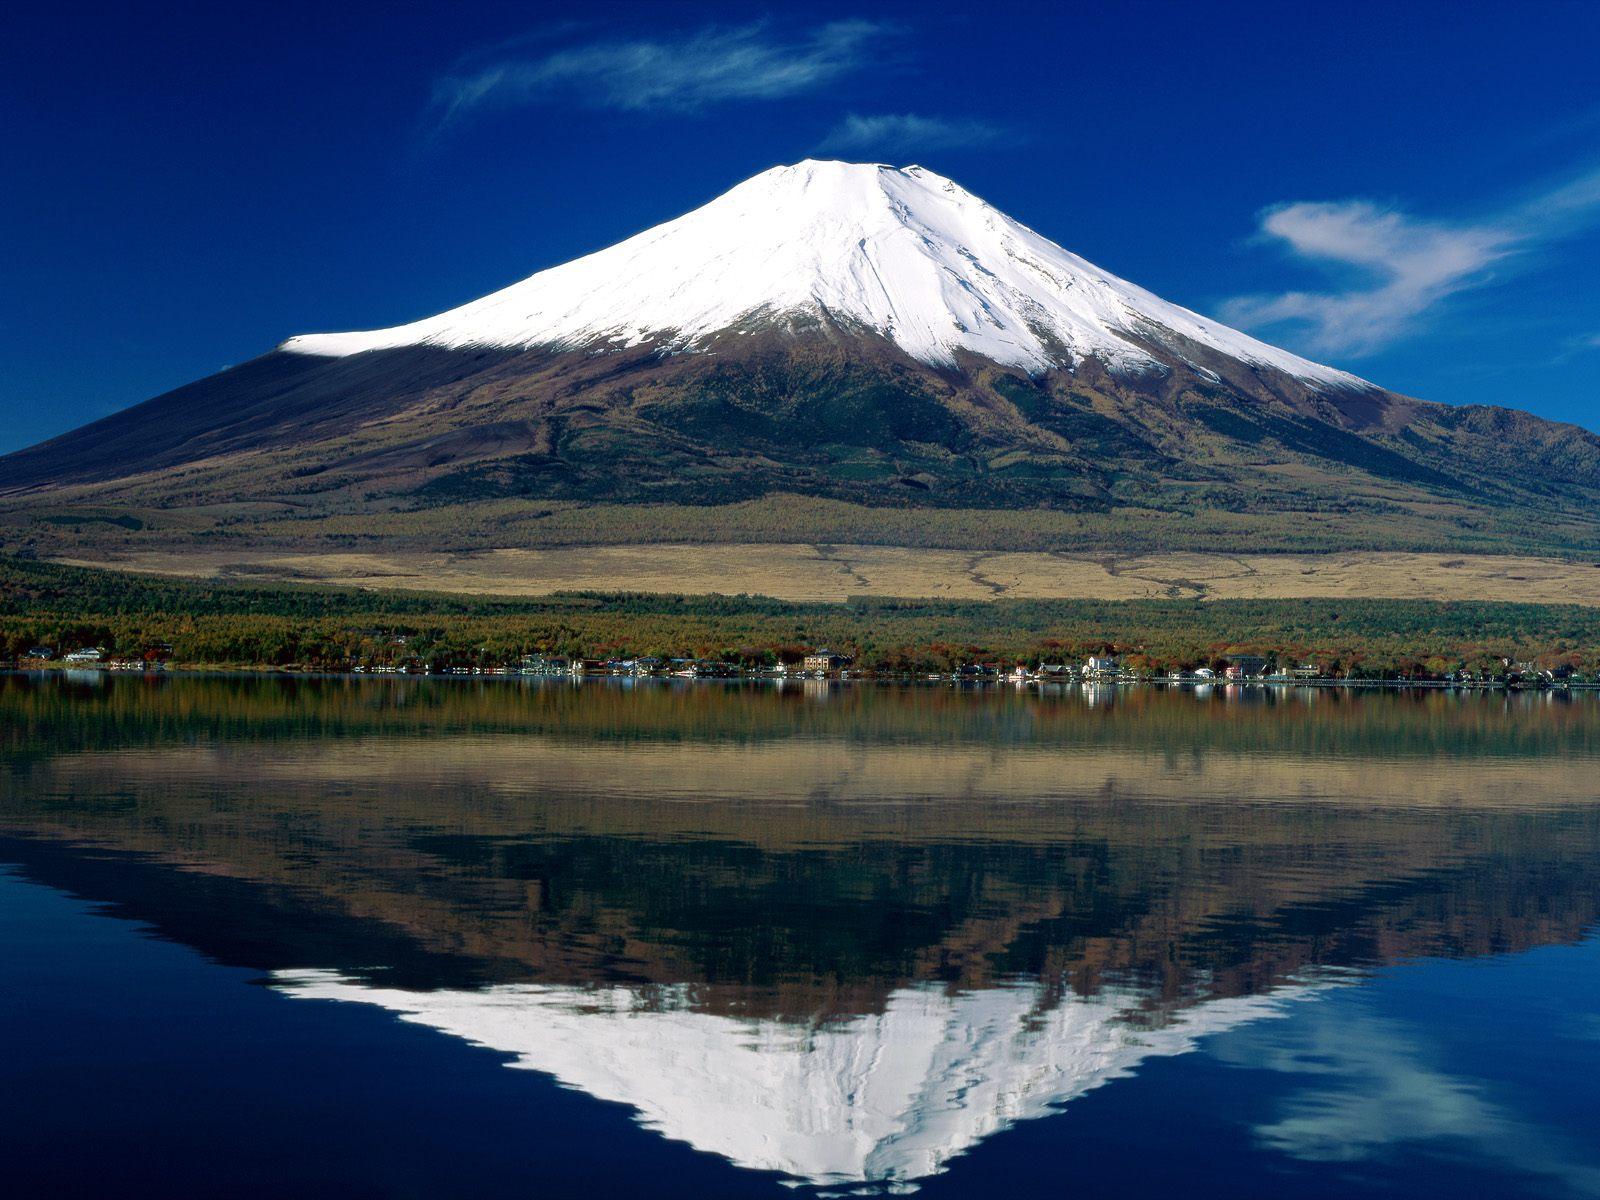 Beautiful Places Mount Fuji Japan